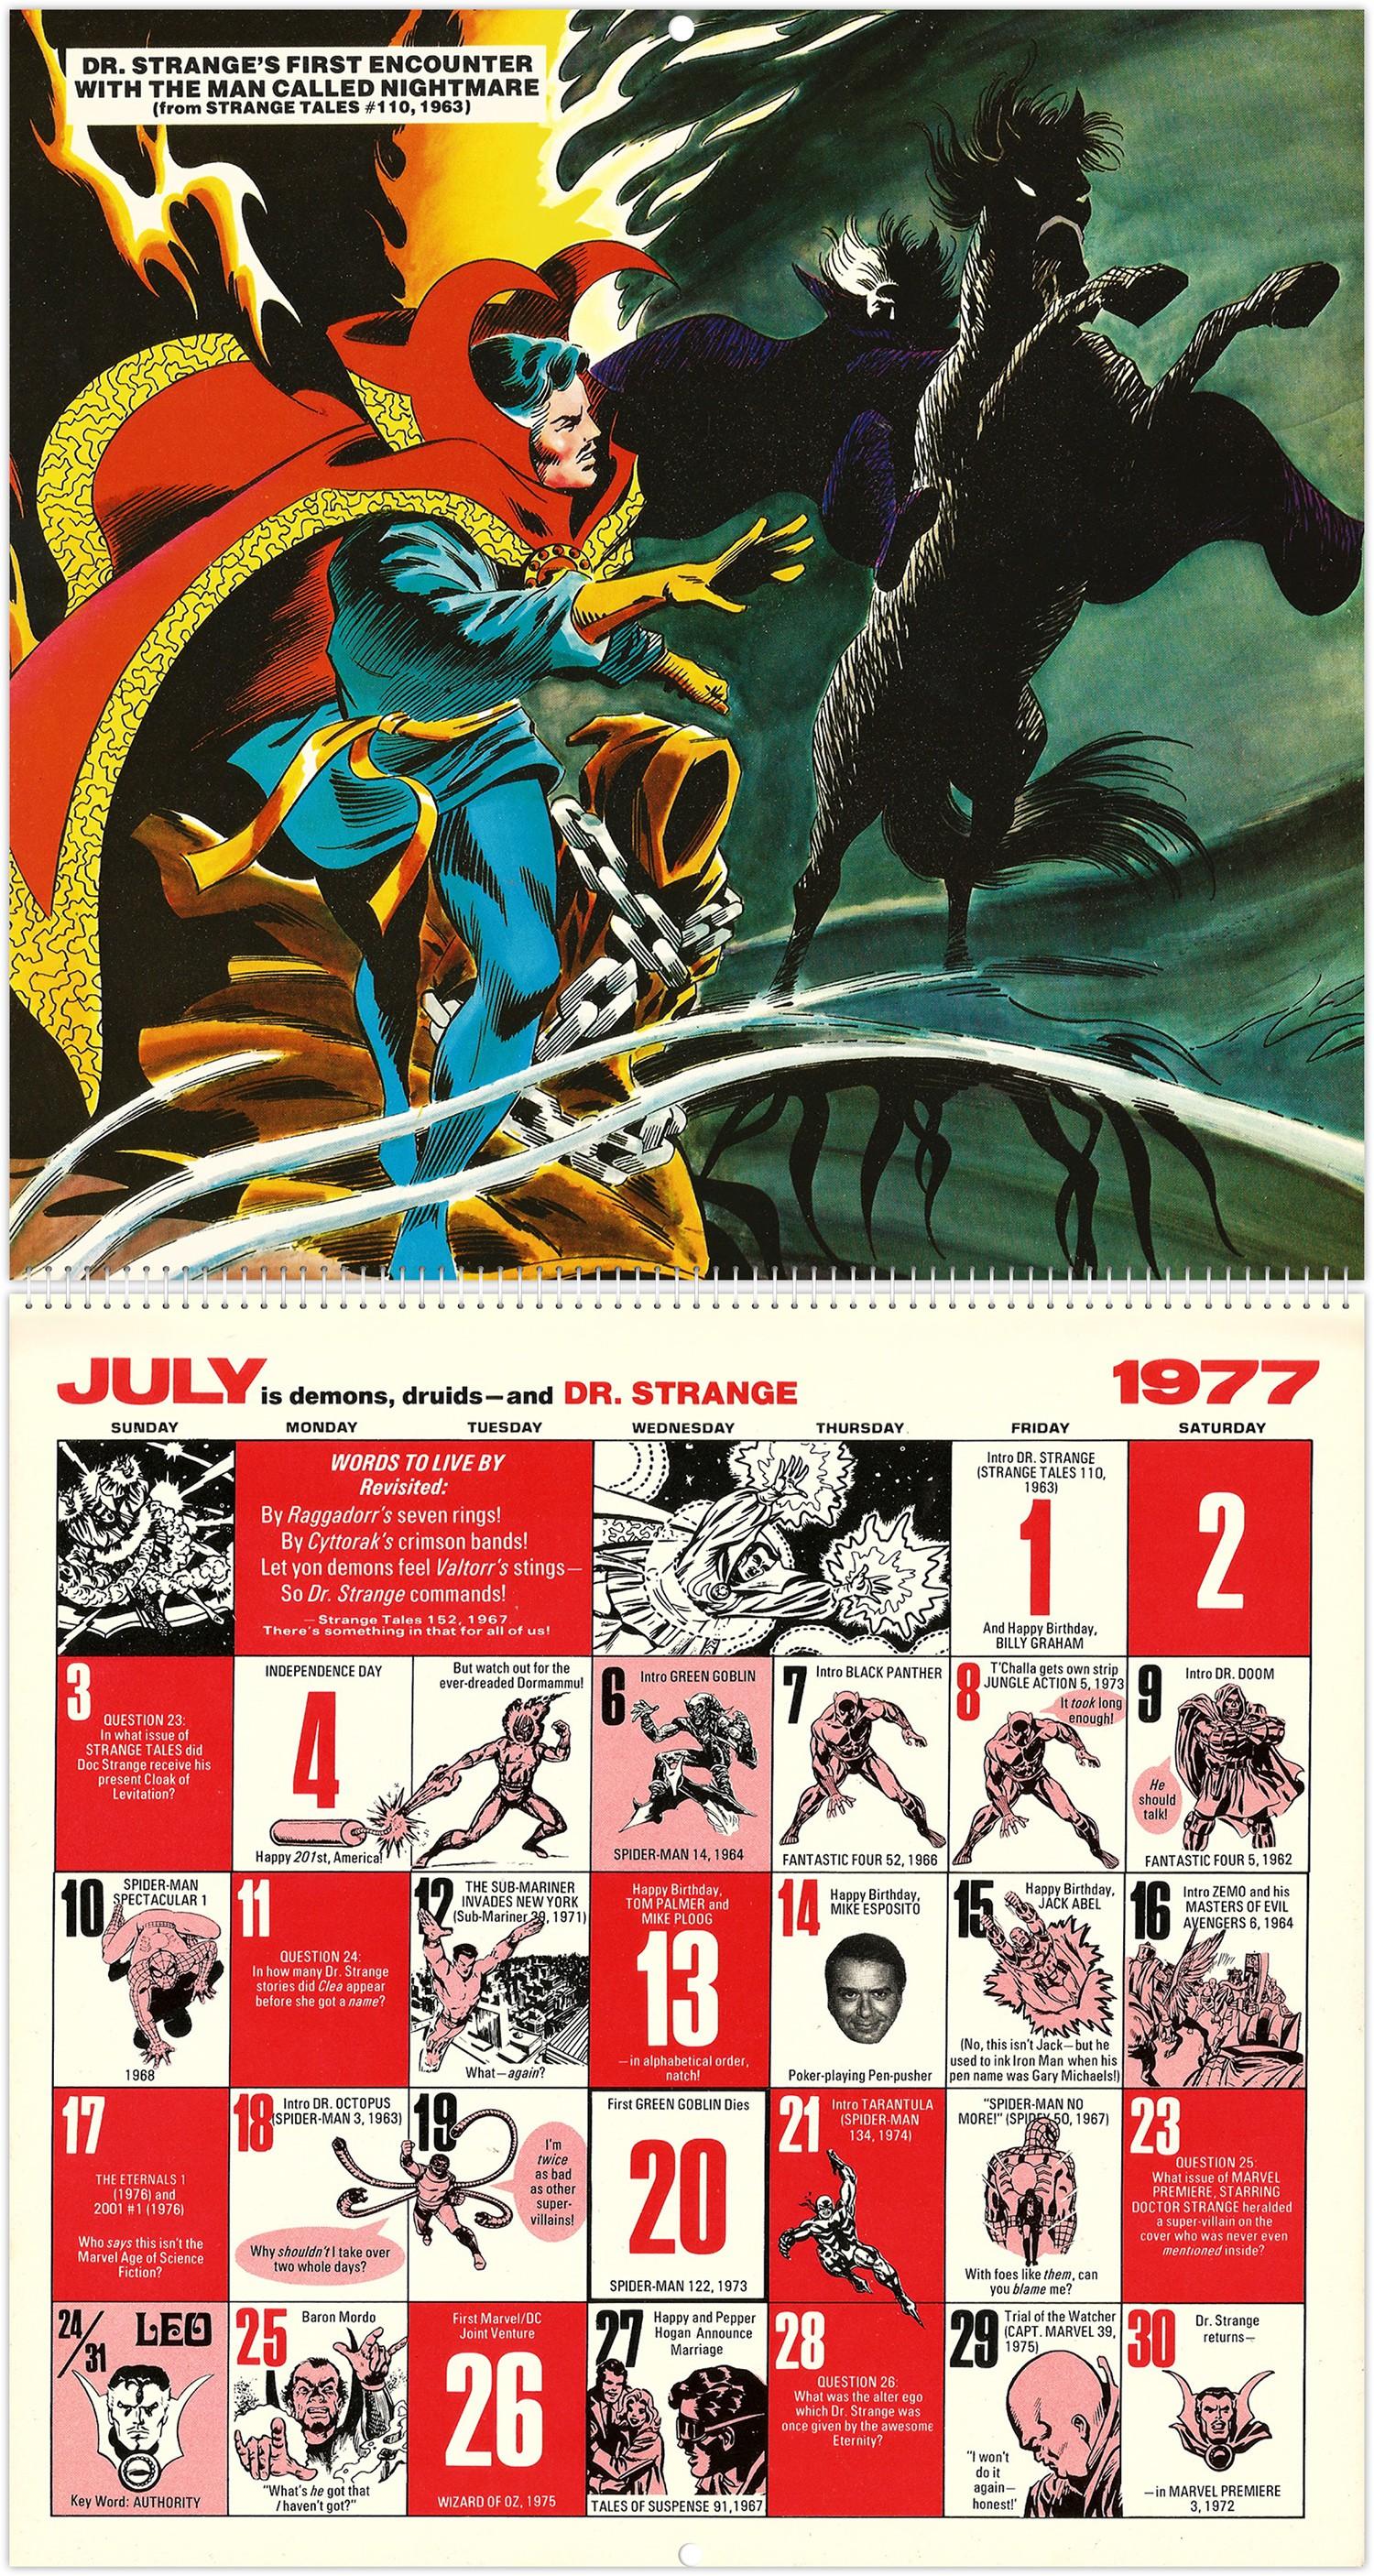 March Calendar Art Más Recientes Marvel Ics Memory Album Calendar 1977 Of March Calendar Art Más Actual Templates for Powerpoint Swimlane Template Luxury A E A Calendar